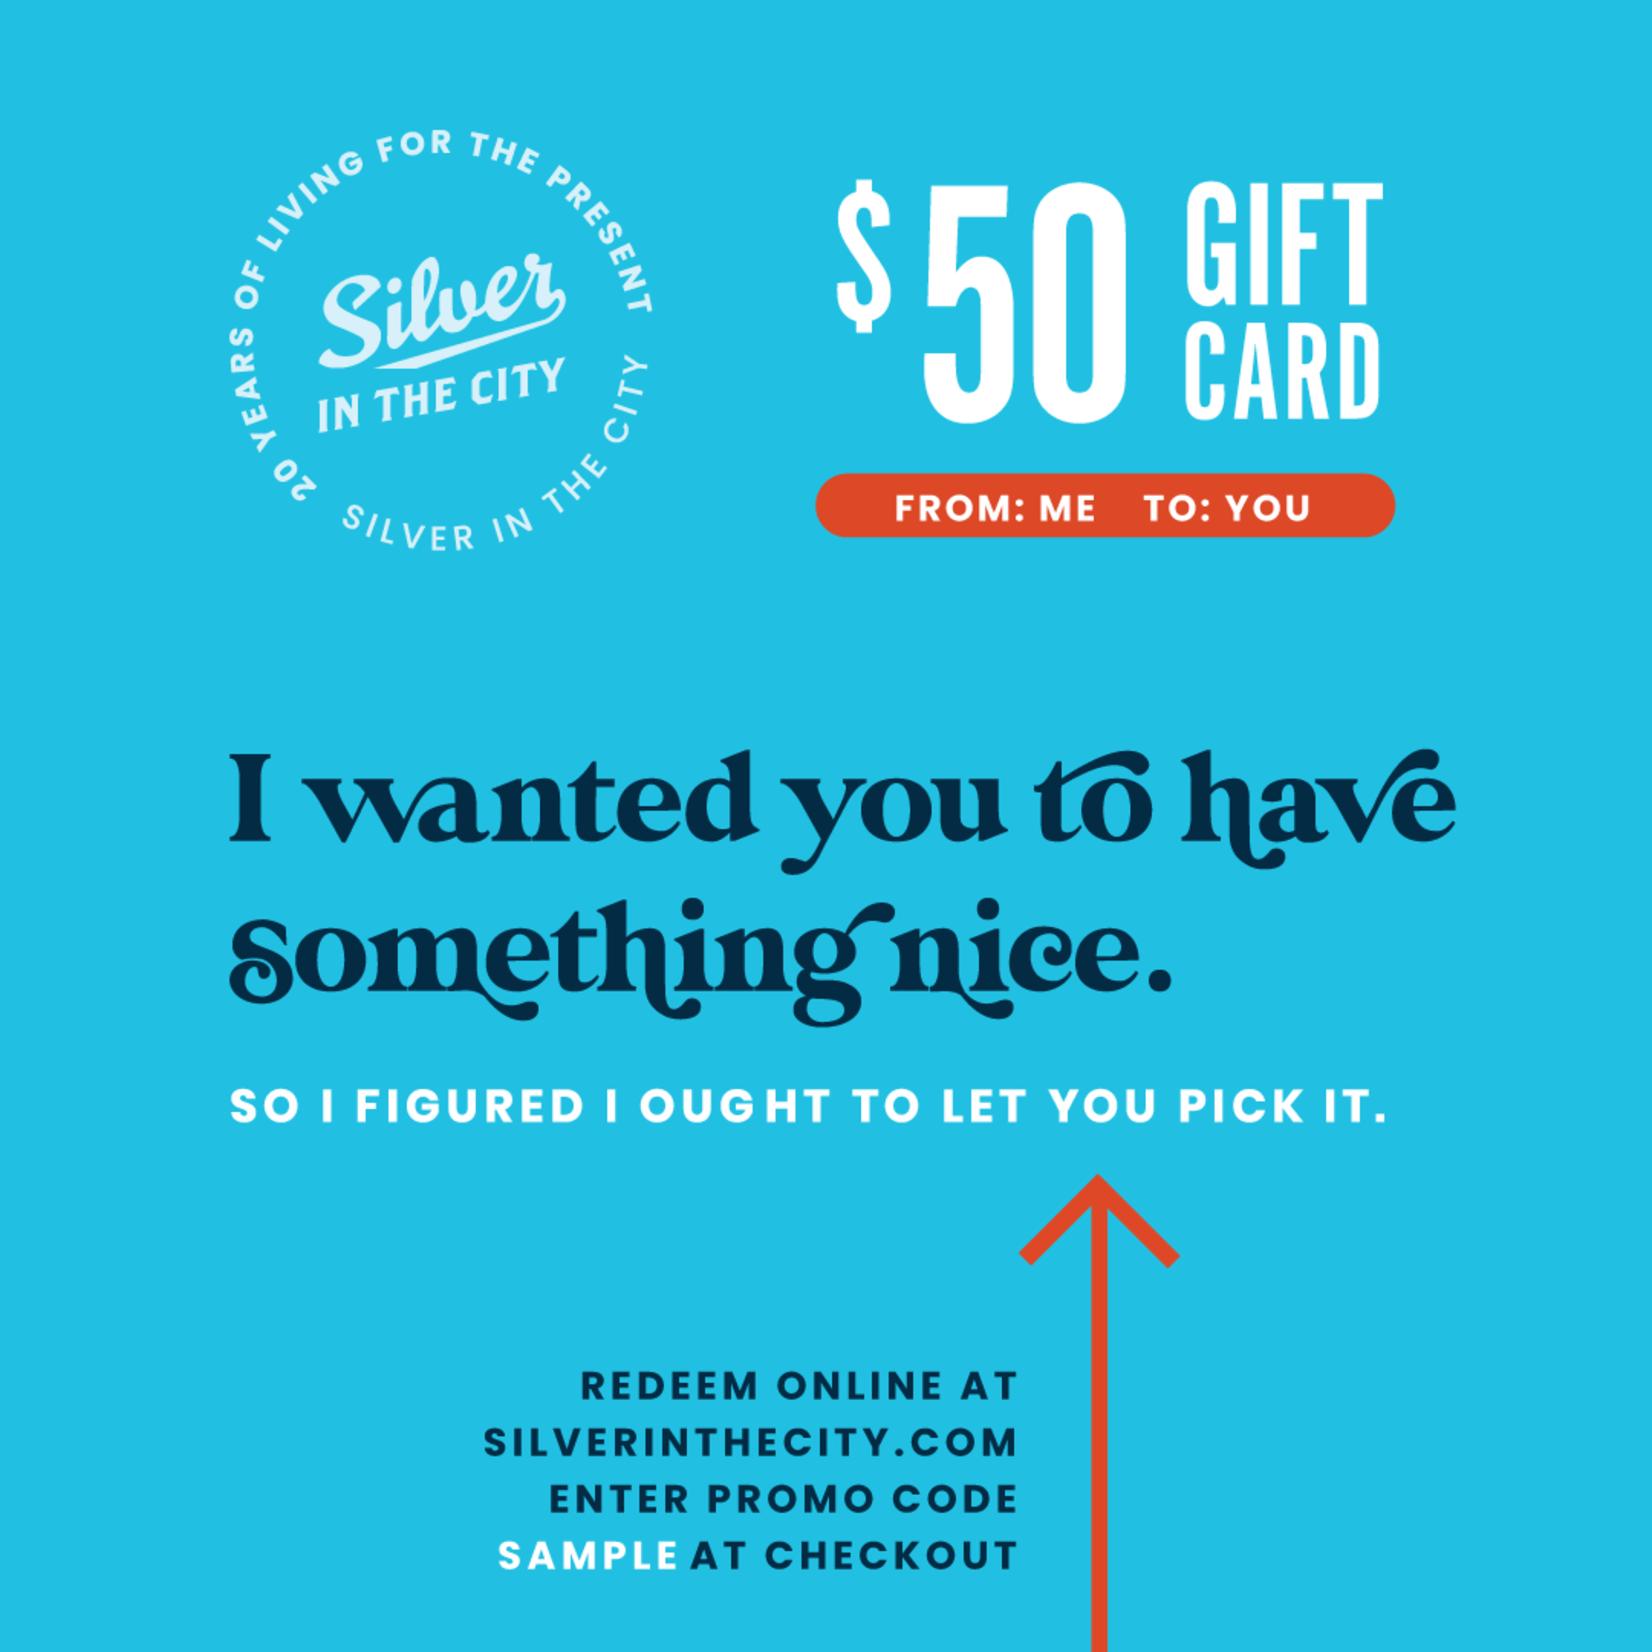 Digital Gift Card for silverinthecity.com